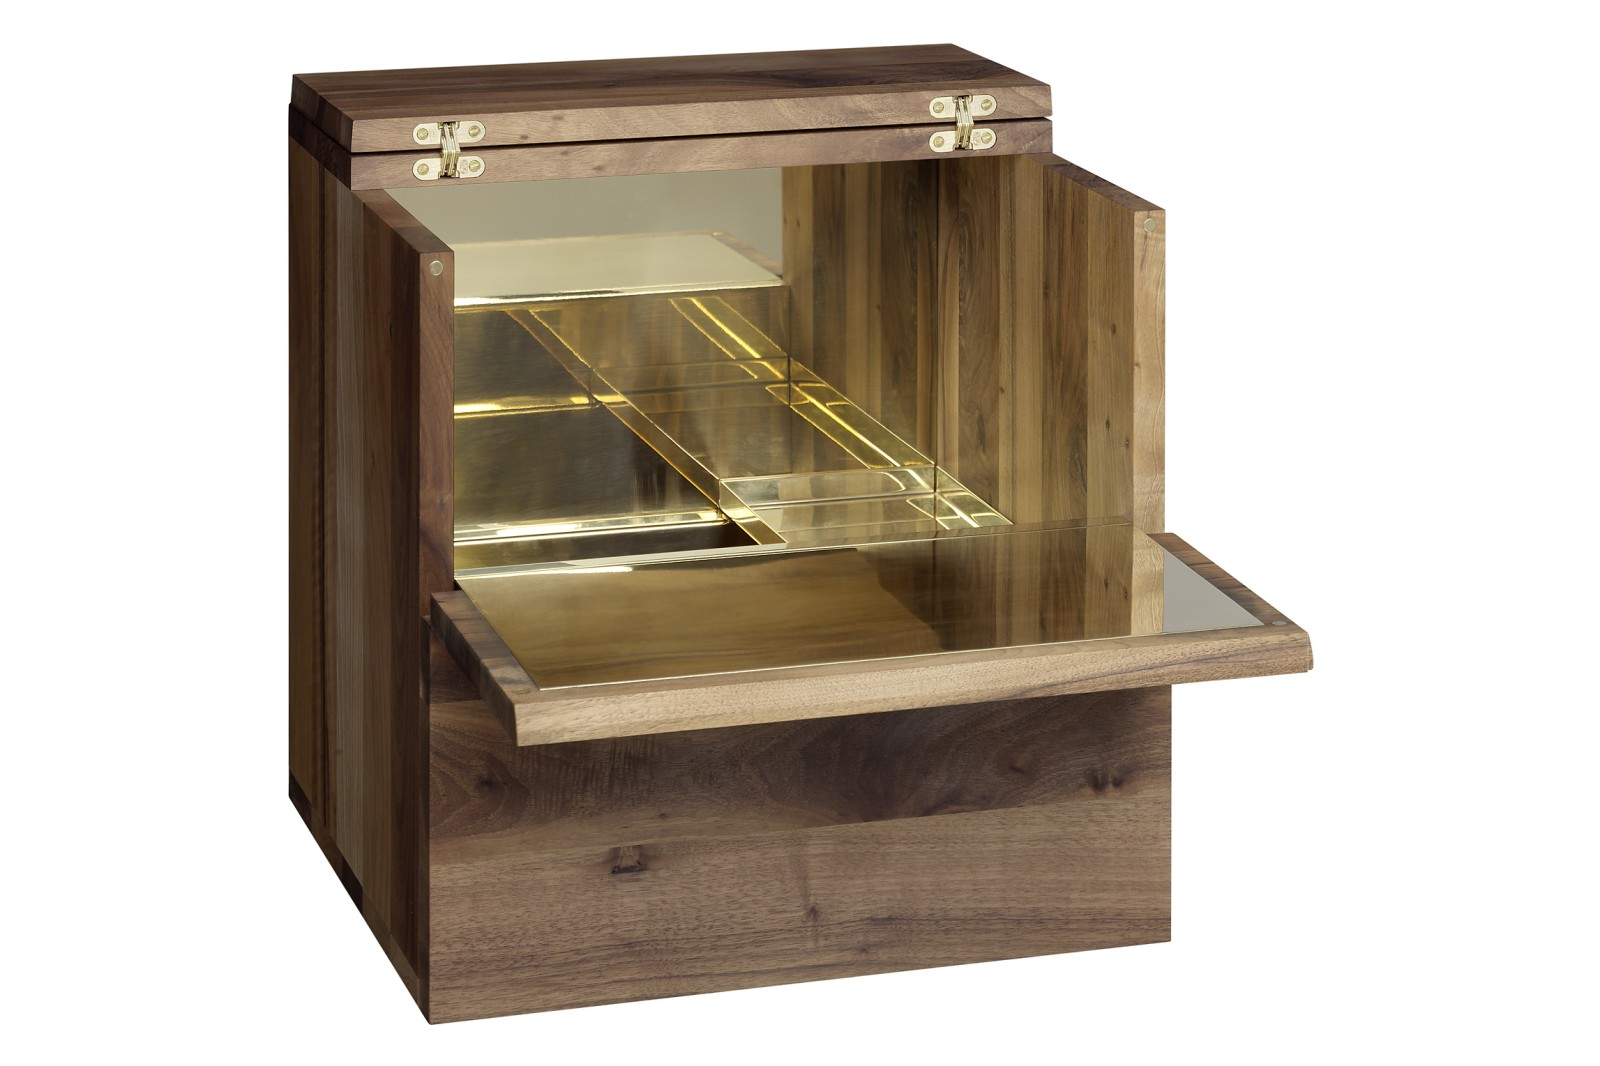 SB10 Araq Bar Cabinet Walnut and Brass, Short